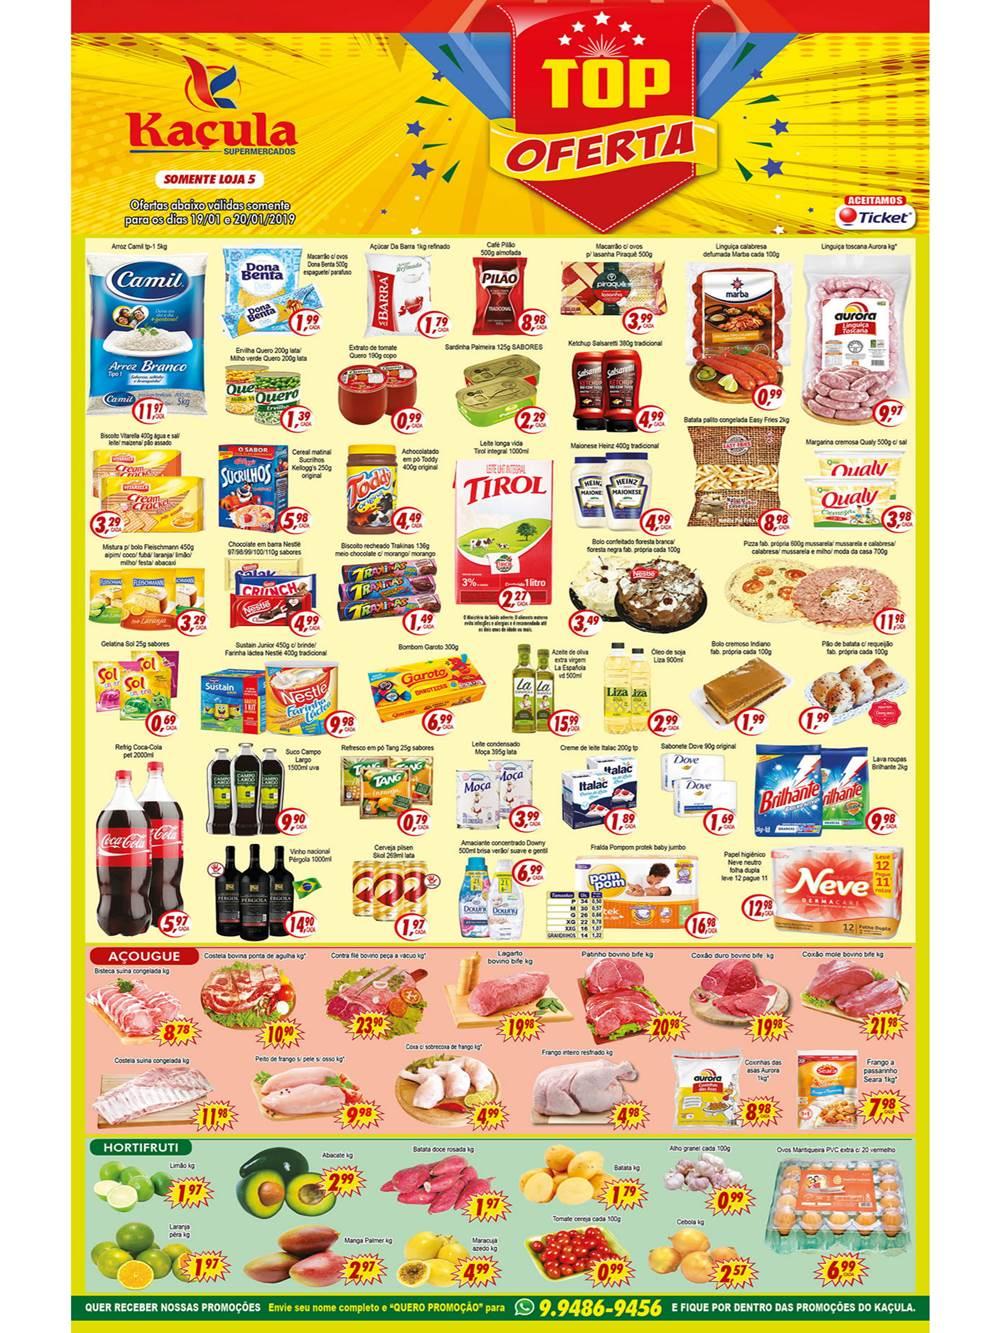 Ofertas-Kacula1-1 Ofertas de Supermercados - Economize!